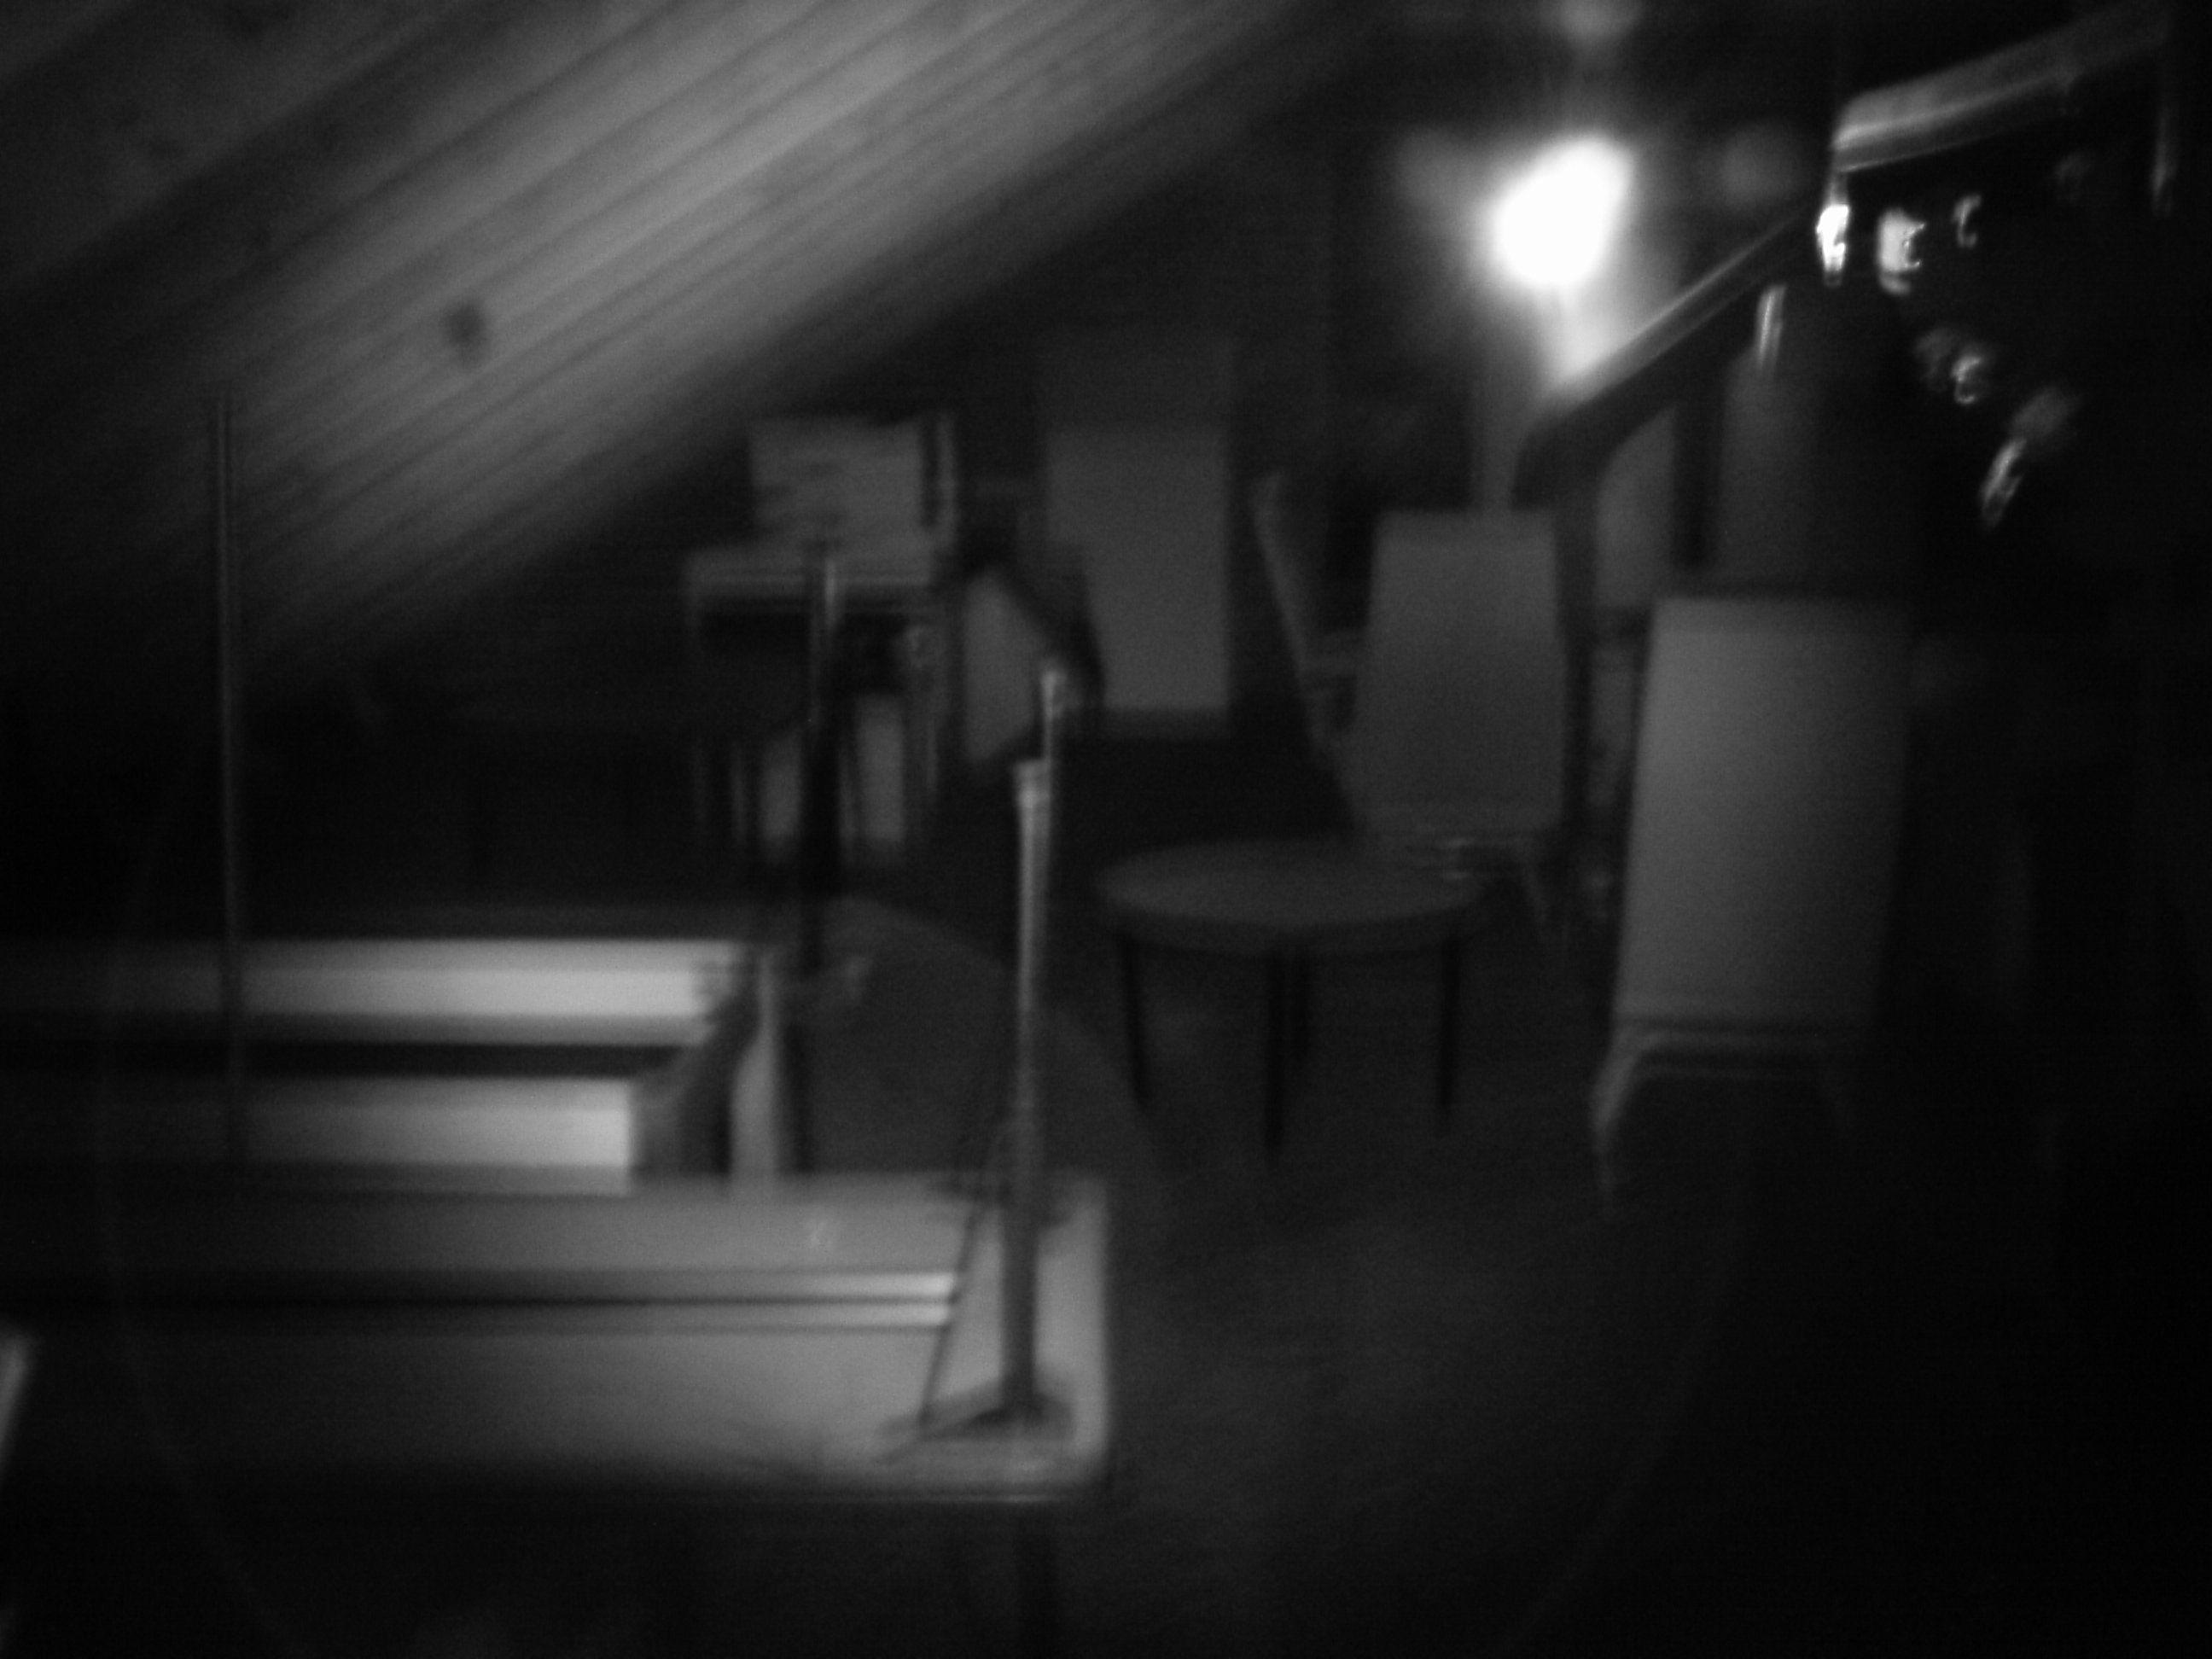 Ghost photo taken in the attic of the Alton YWCA. #STLPRS